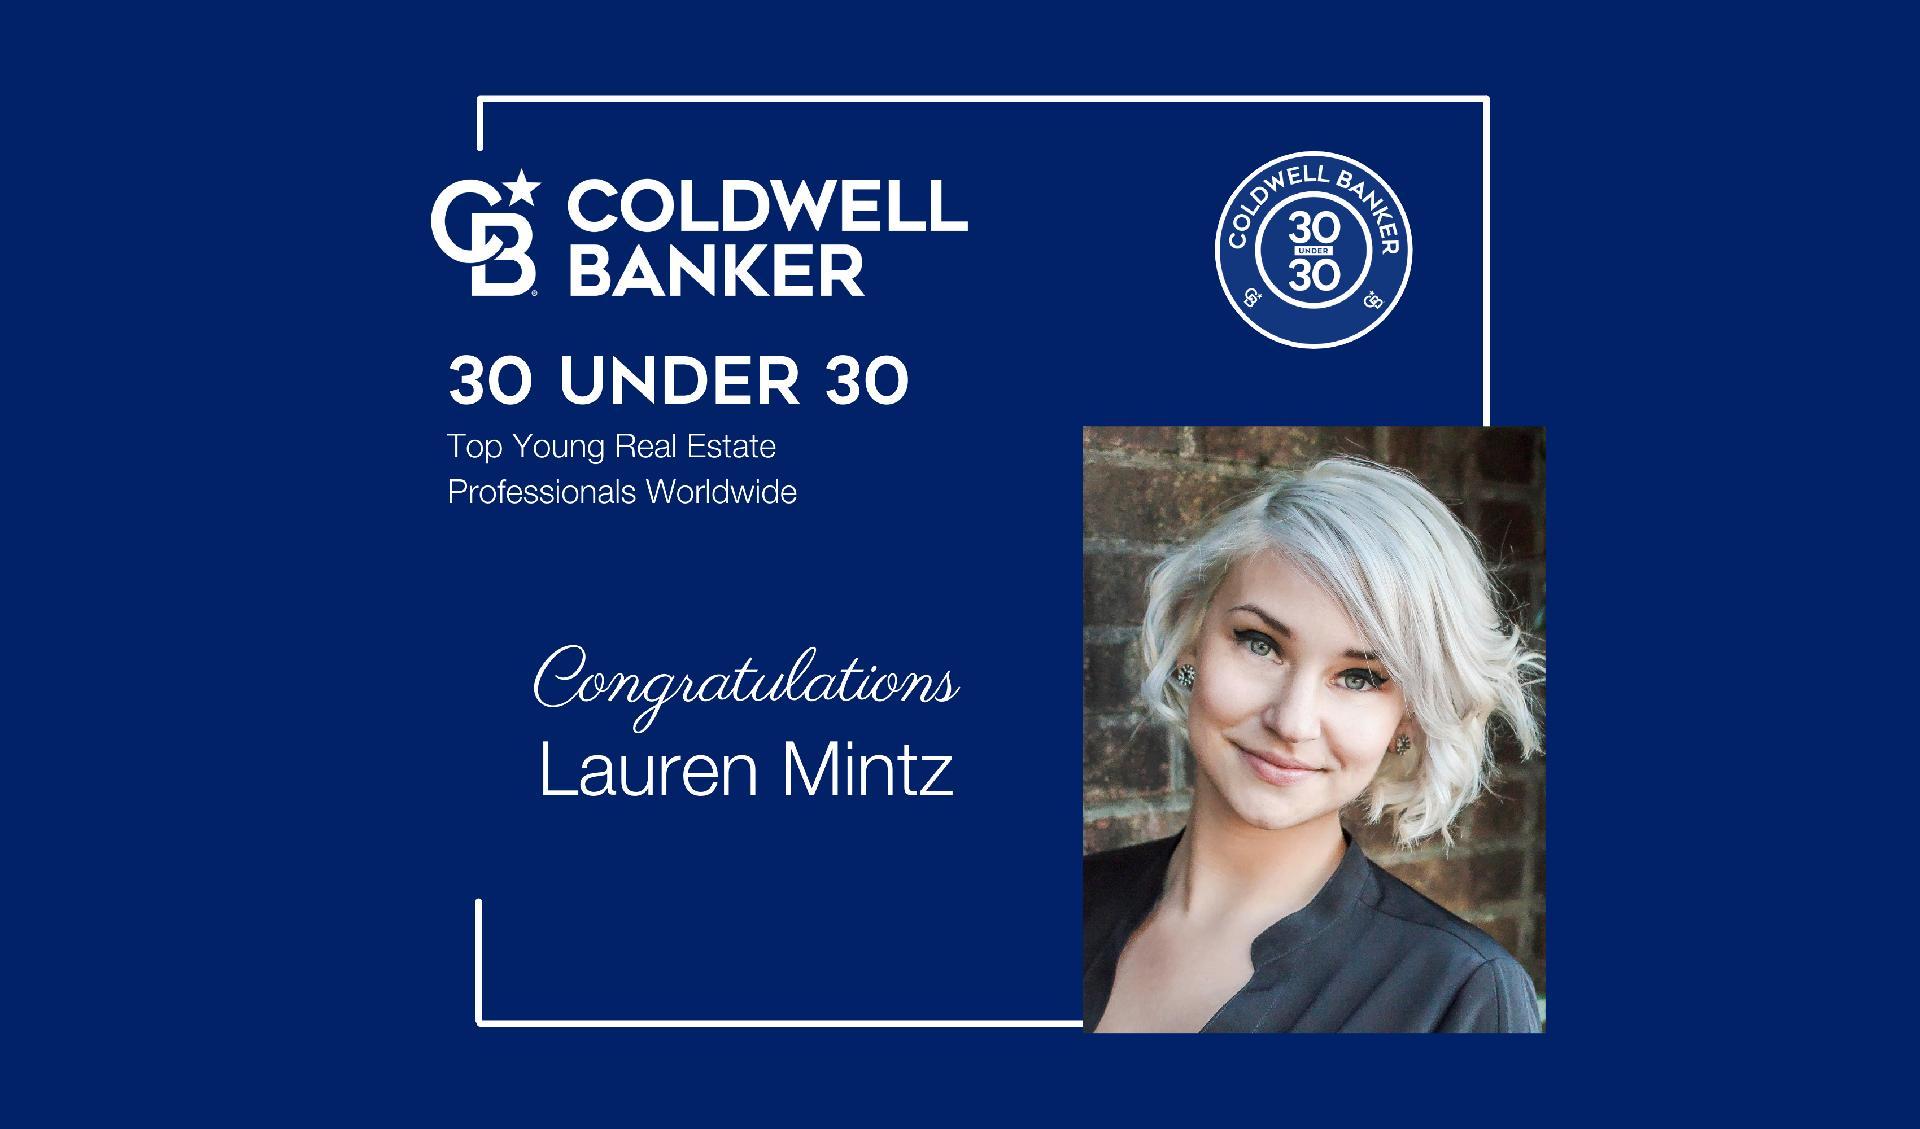 Lauren Mintz Named to Coldwell Banker International 30 Under 30 Main Photo